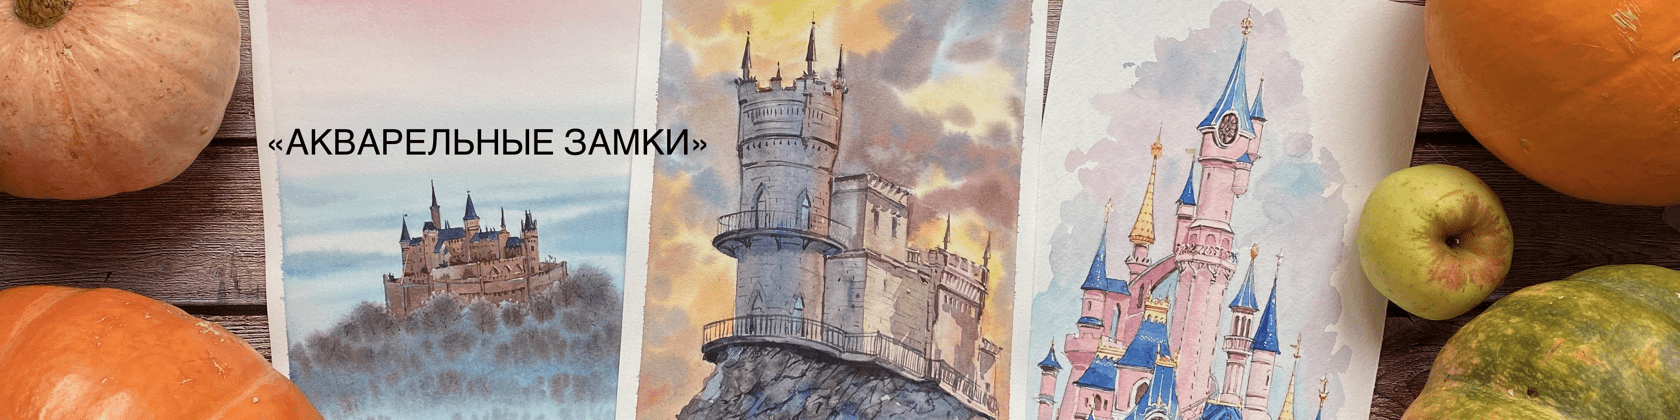 https://samouchka-school.ru/courses/kurs-akvarelnye-zamki